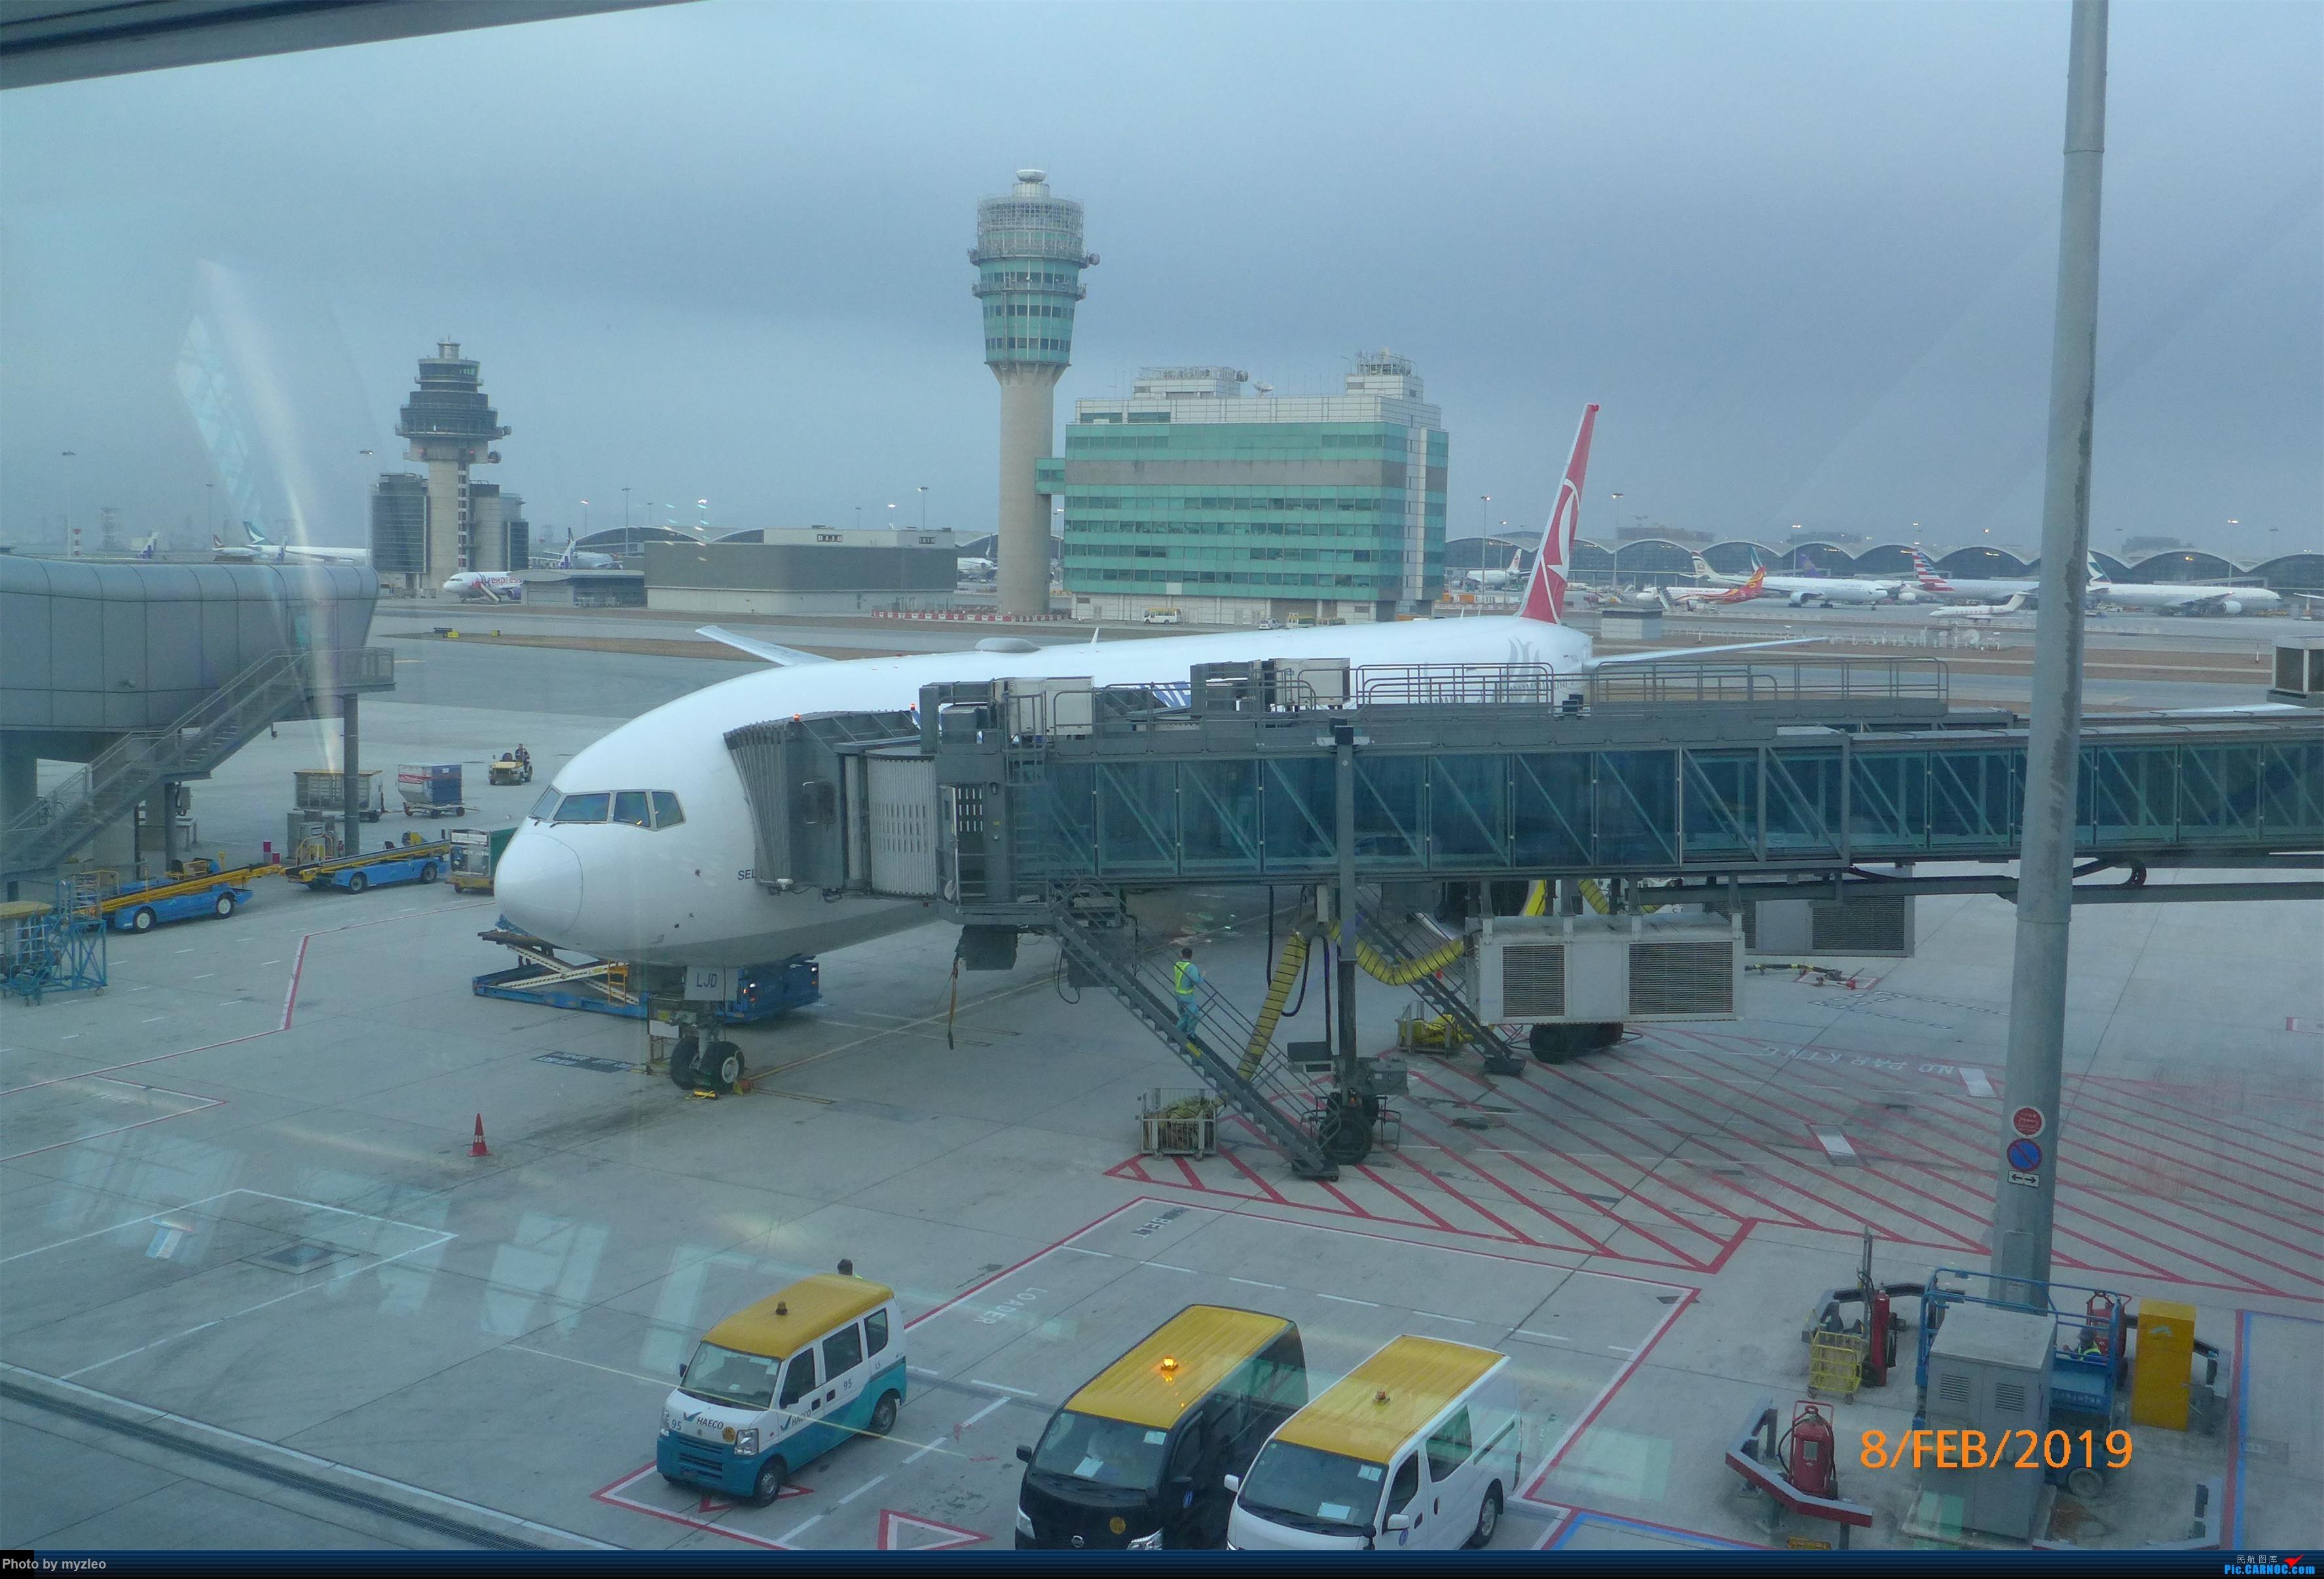 Re:[原创]【myzleo的游记4.5】十年之约(5)在香港的最后一天,搭乘港航333回沪 BOEING 777-300ER  中国香港国际机场